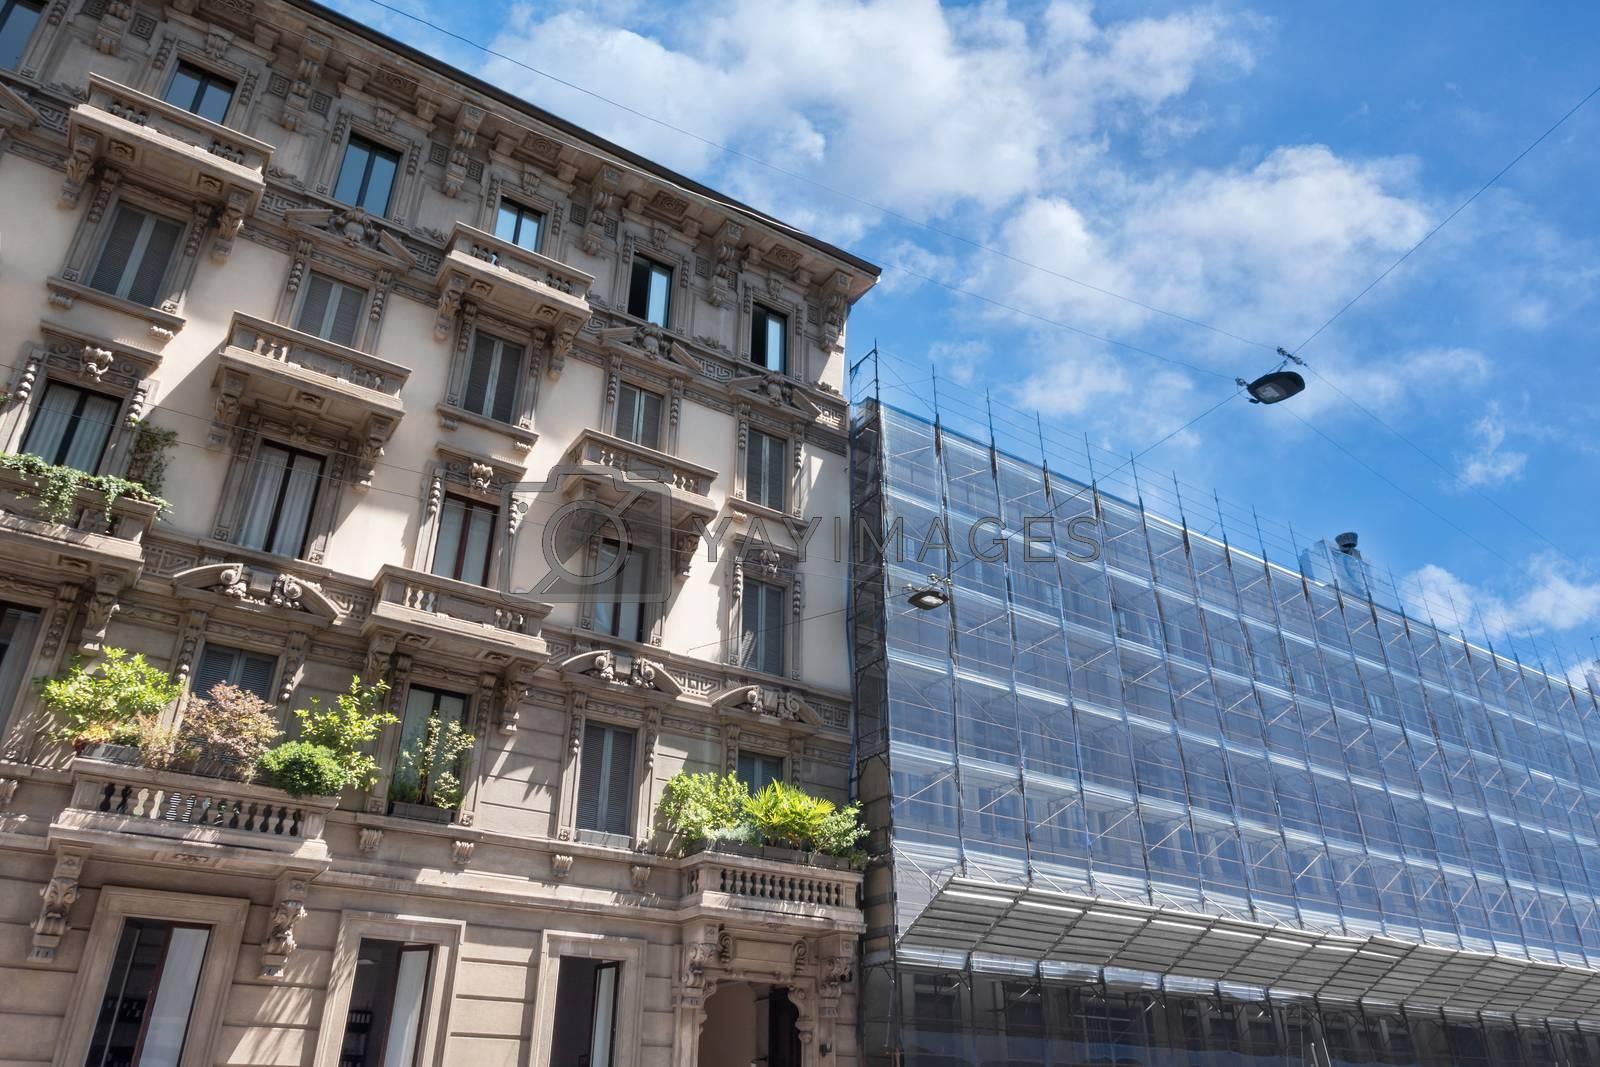 Scaffolding on a historic Italian palace, building under renovation.